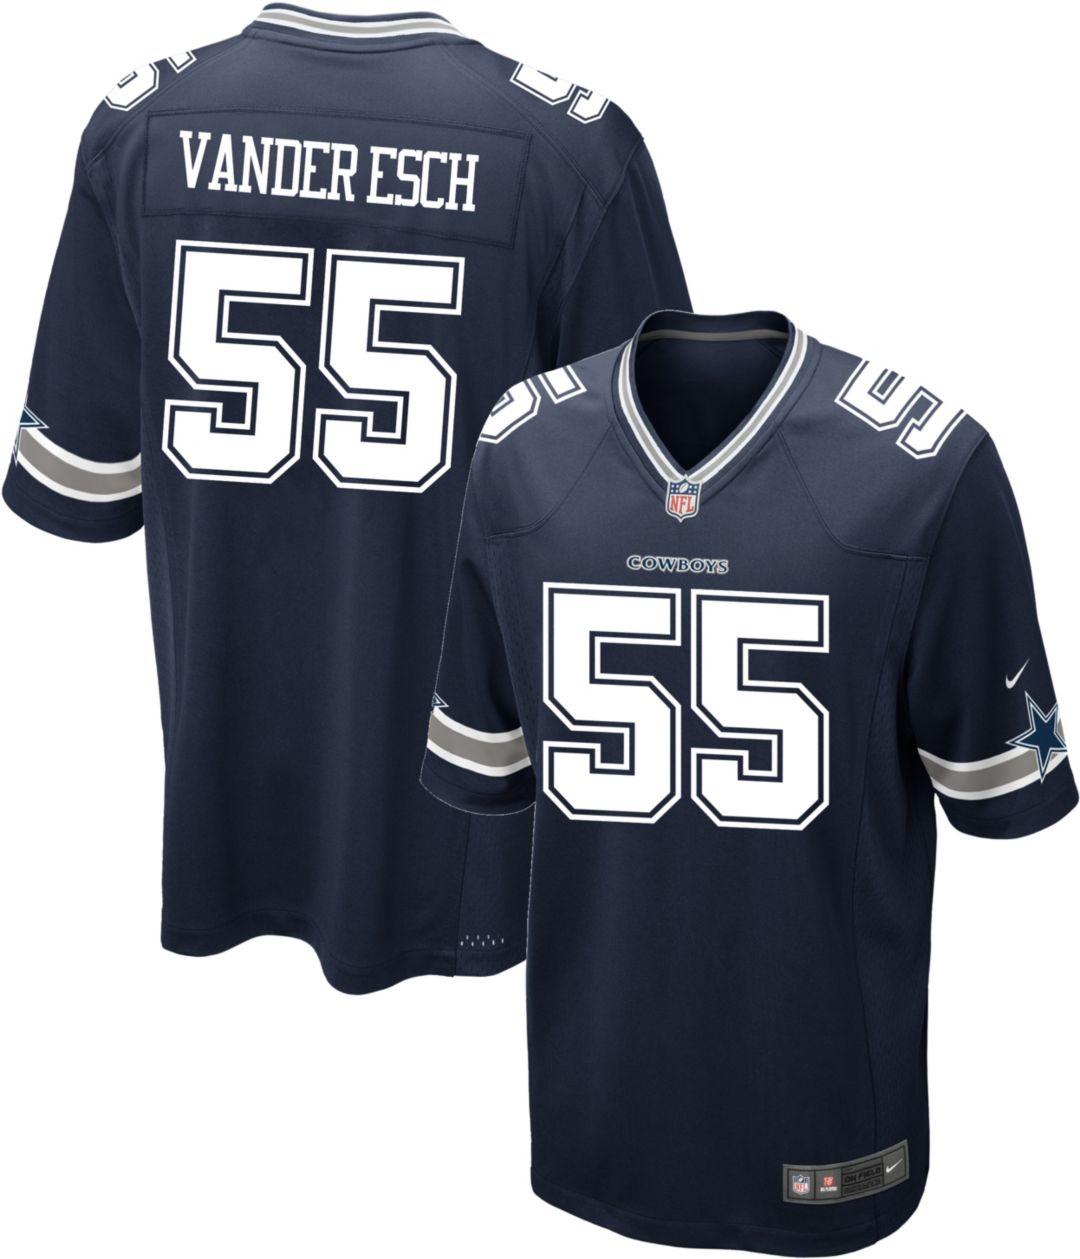 sale retailer ac09a 1f2c5 Leighton Vander Esch #55 Nike Men's Dallas Cowboys Game Jersey